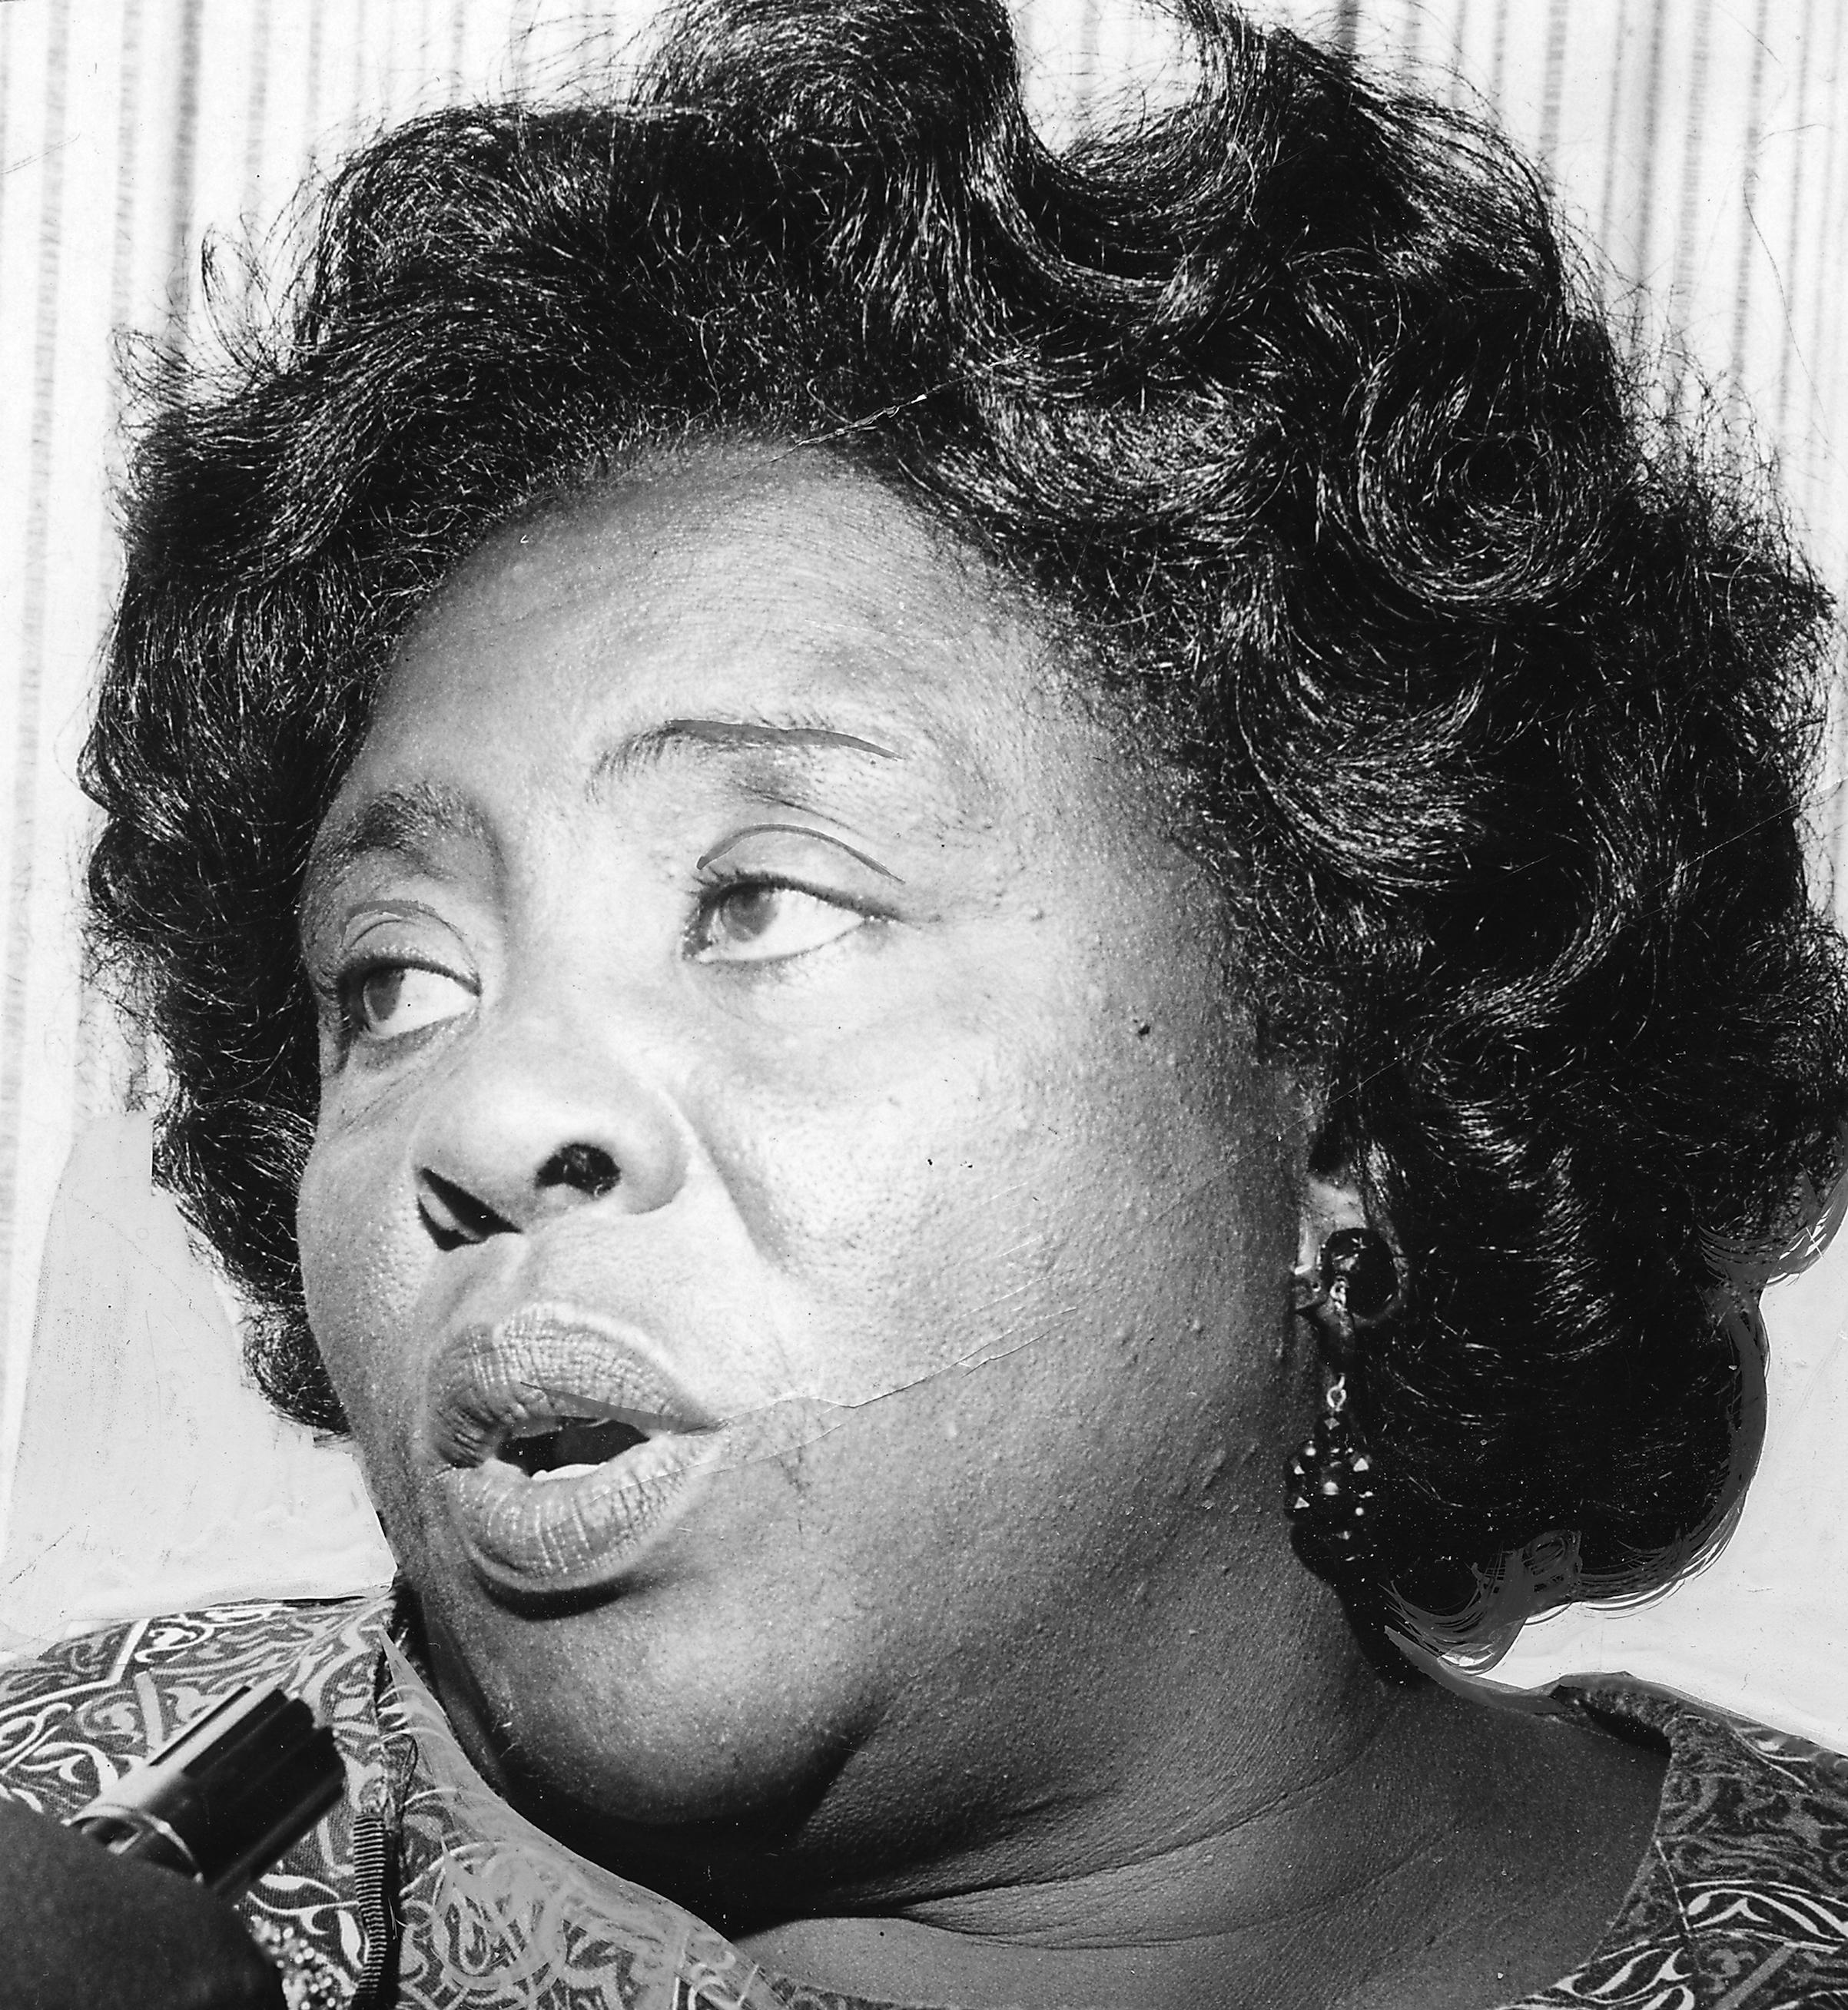 Portrait of civil rights activist and organizer Fannie Lou Hamer, 1965.